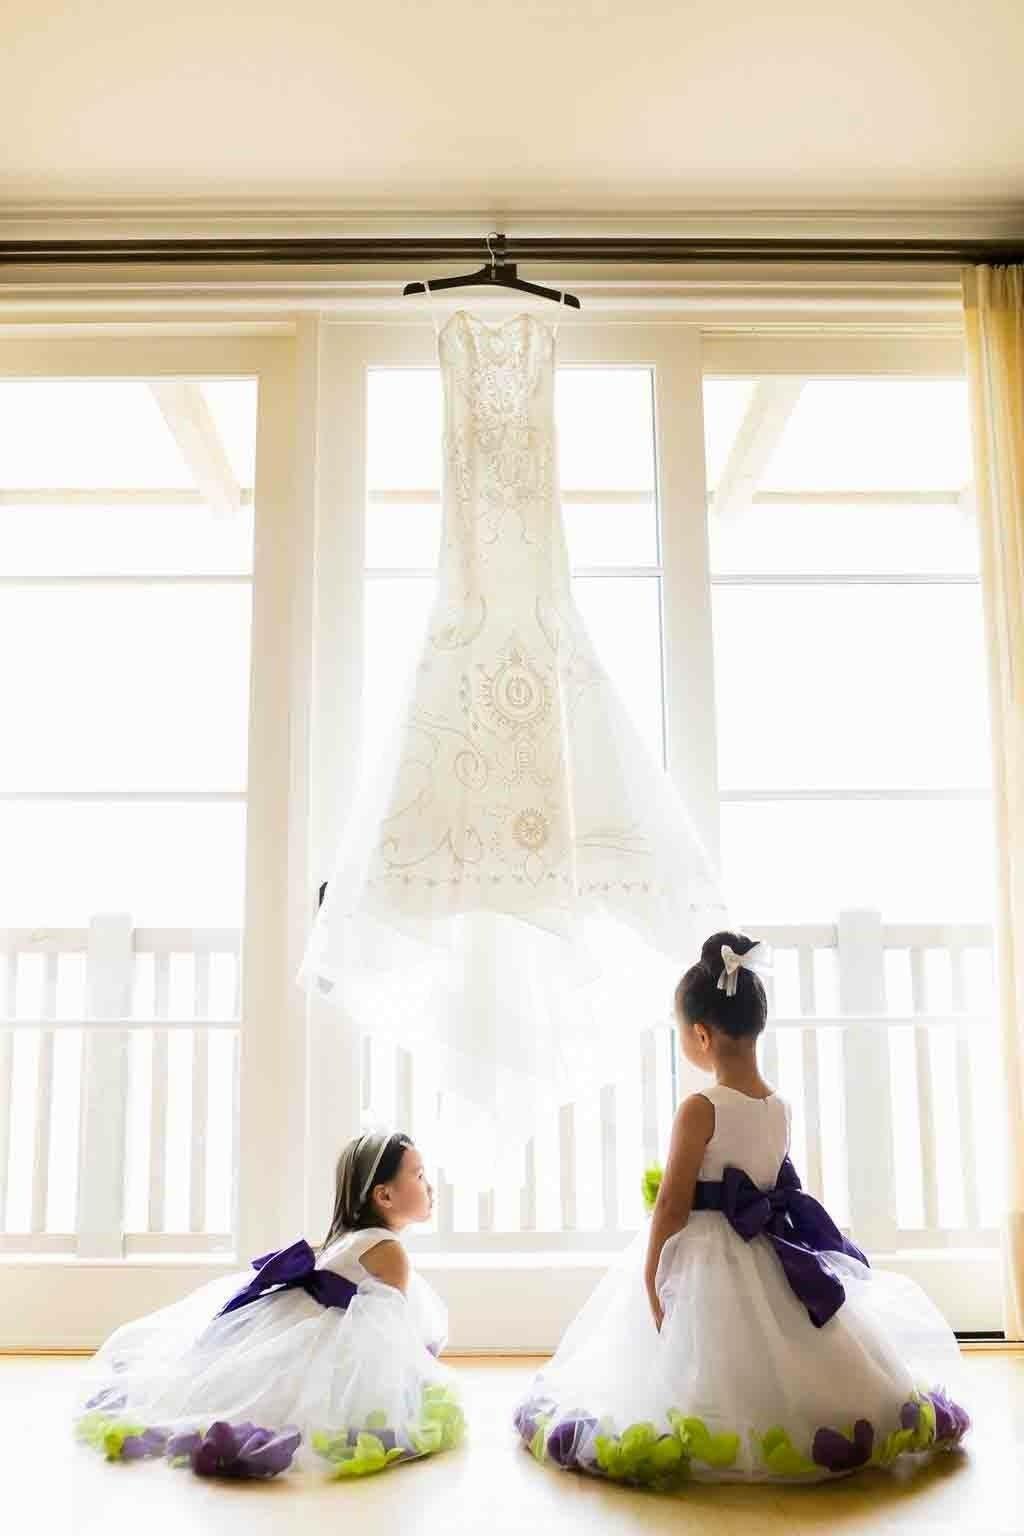 Pin by rashelle samuel on wedding fantasy pinterest weddings